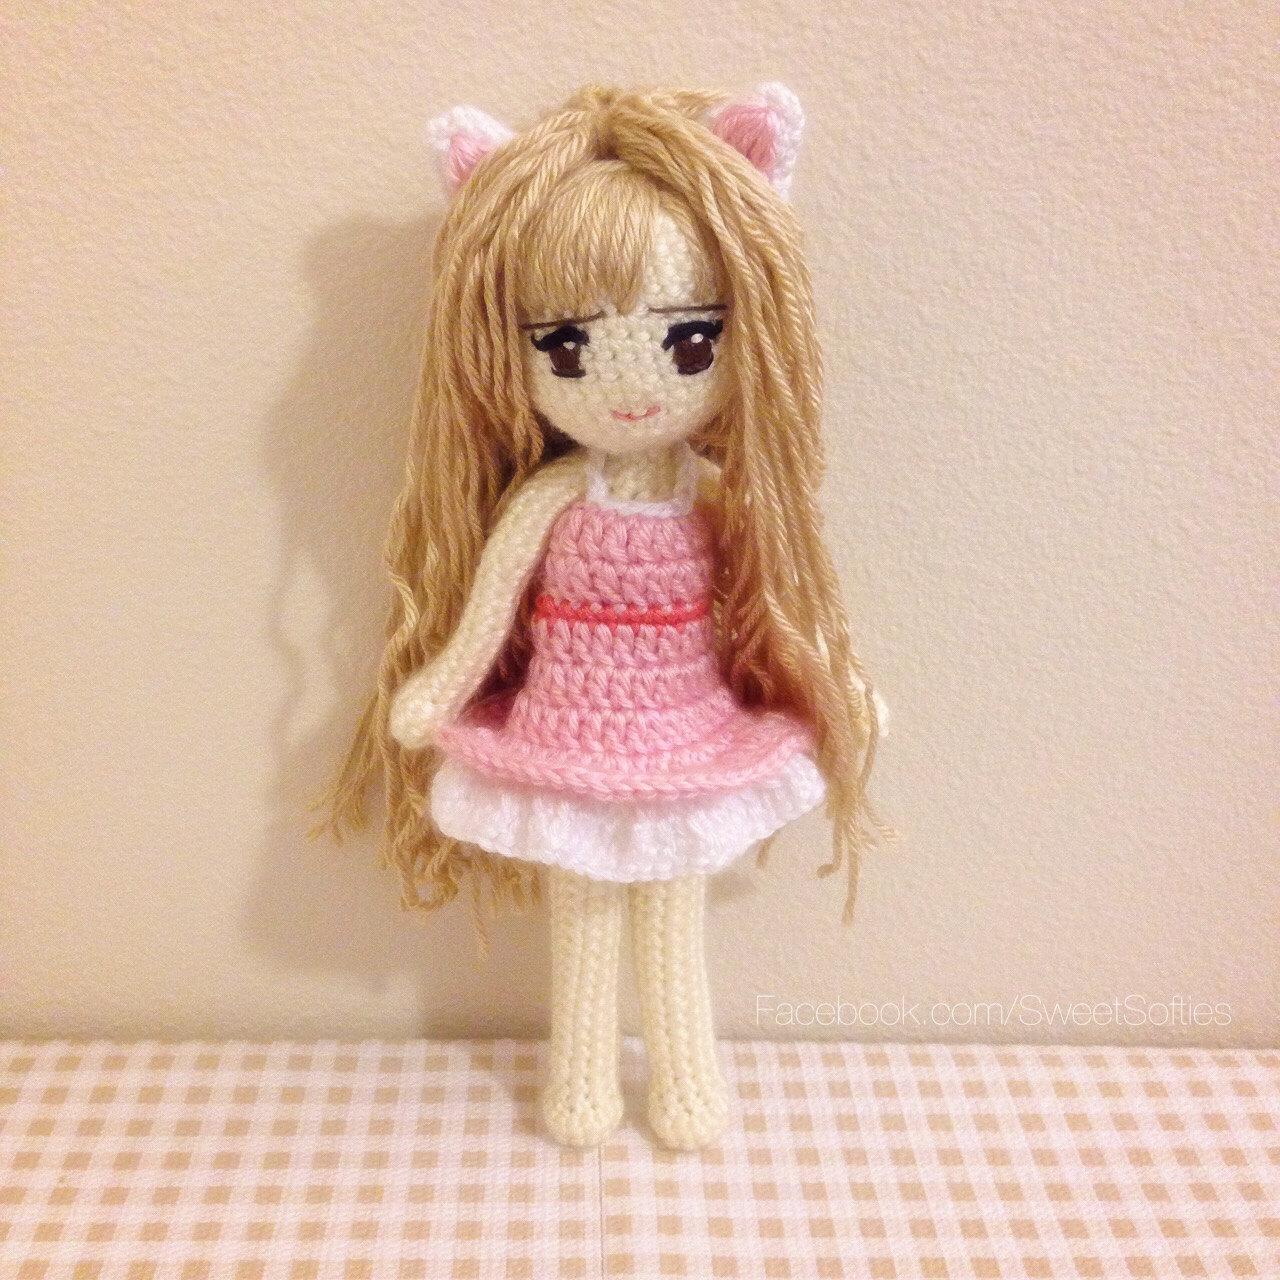 Amigurumi Crochet Doll Pattern Anime Kiki the Kitty Cat by ...